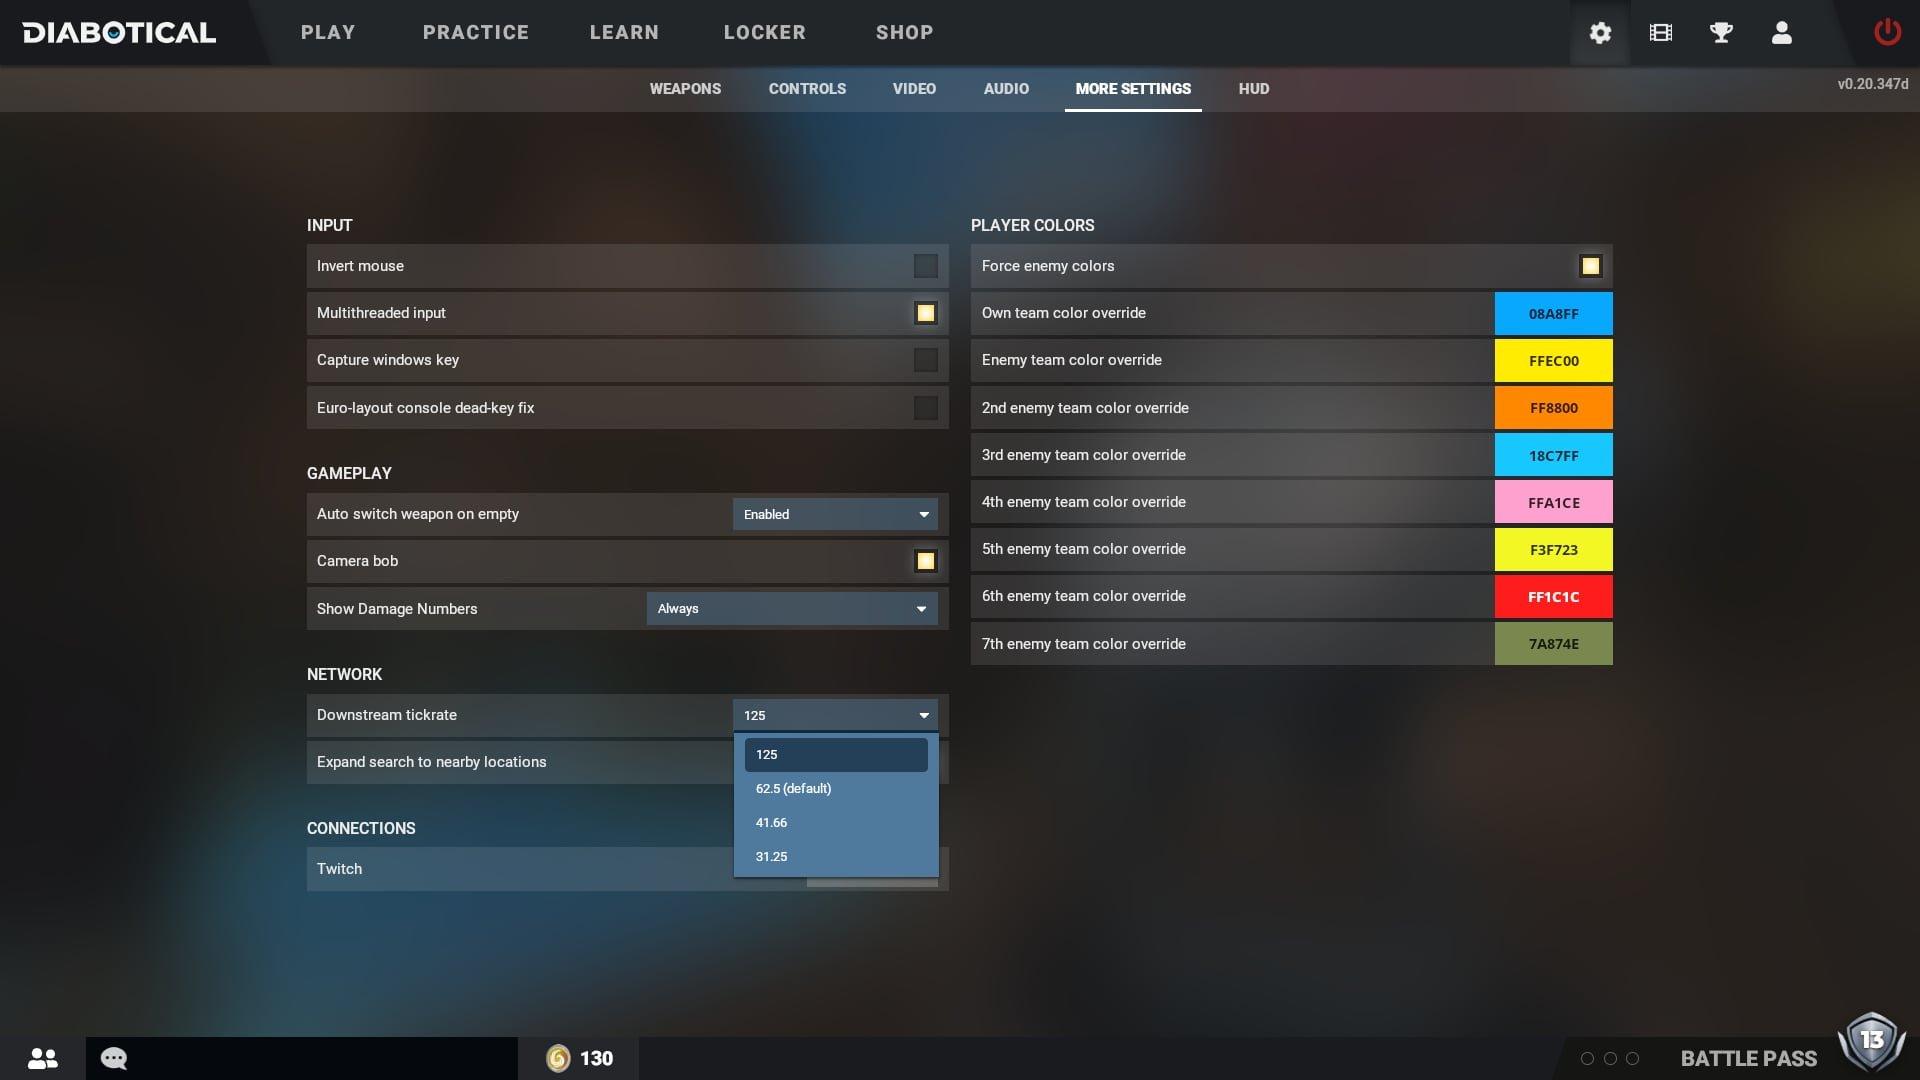 Diabotical Settings UI